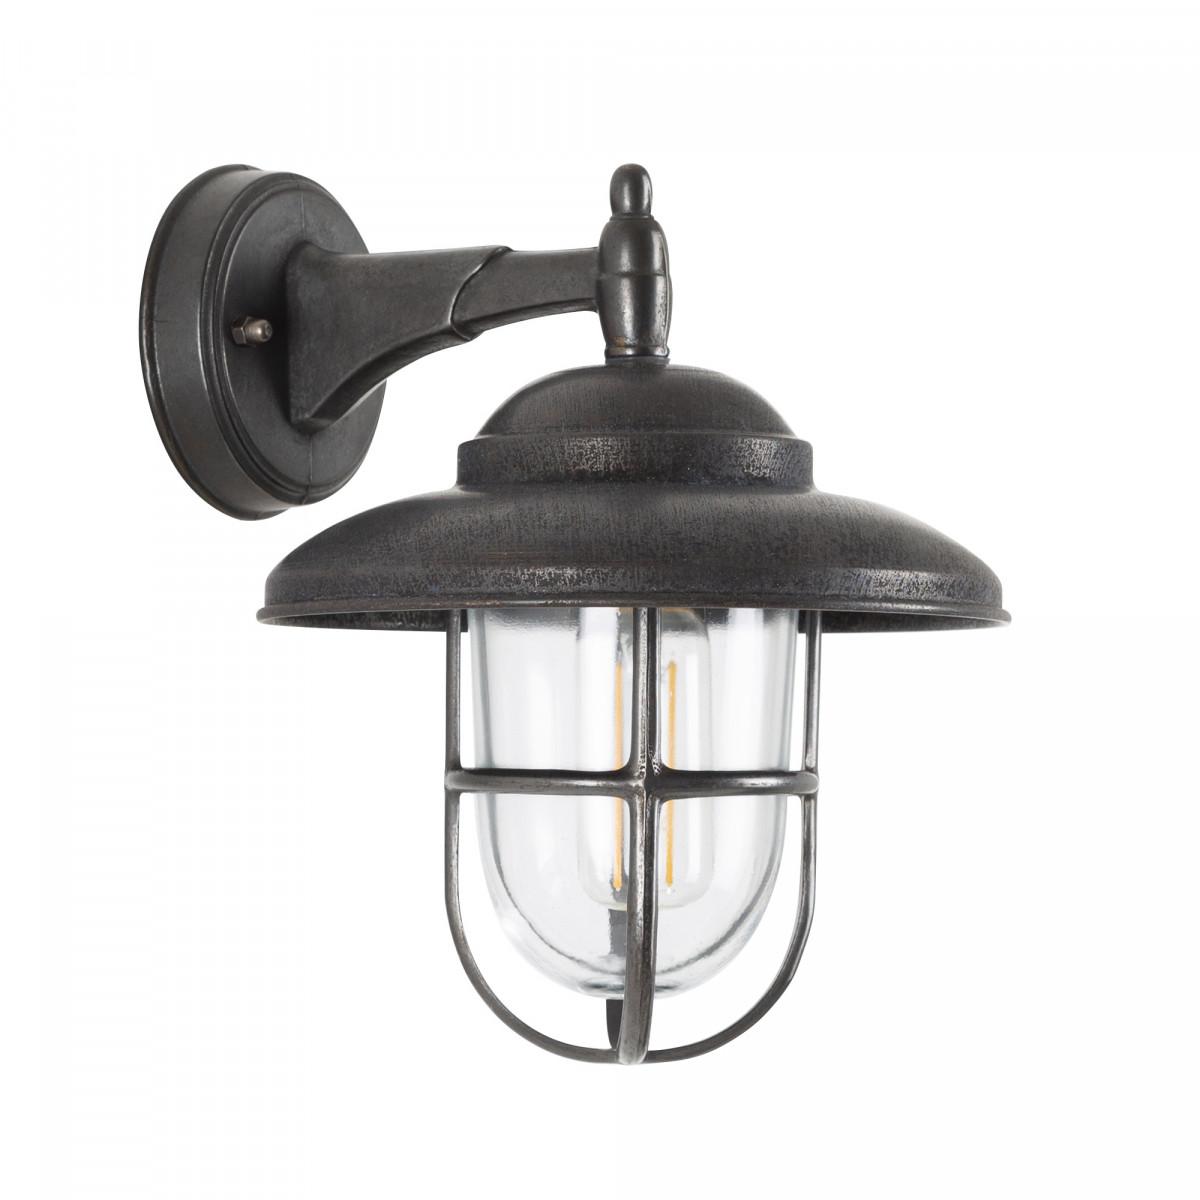 Monte (7708) - KS Verlichting - Buitenverlichting wandlamp antiek brons